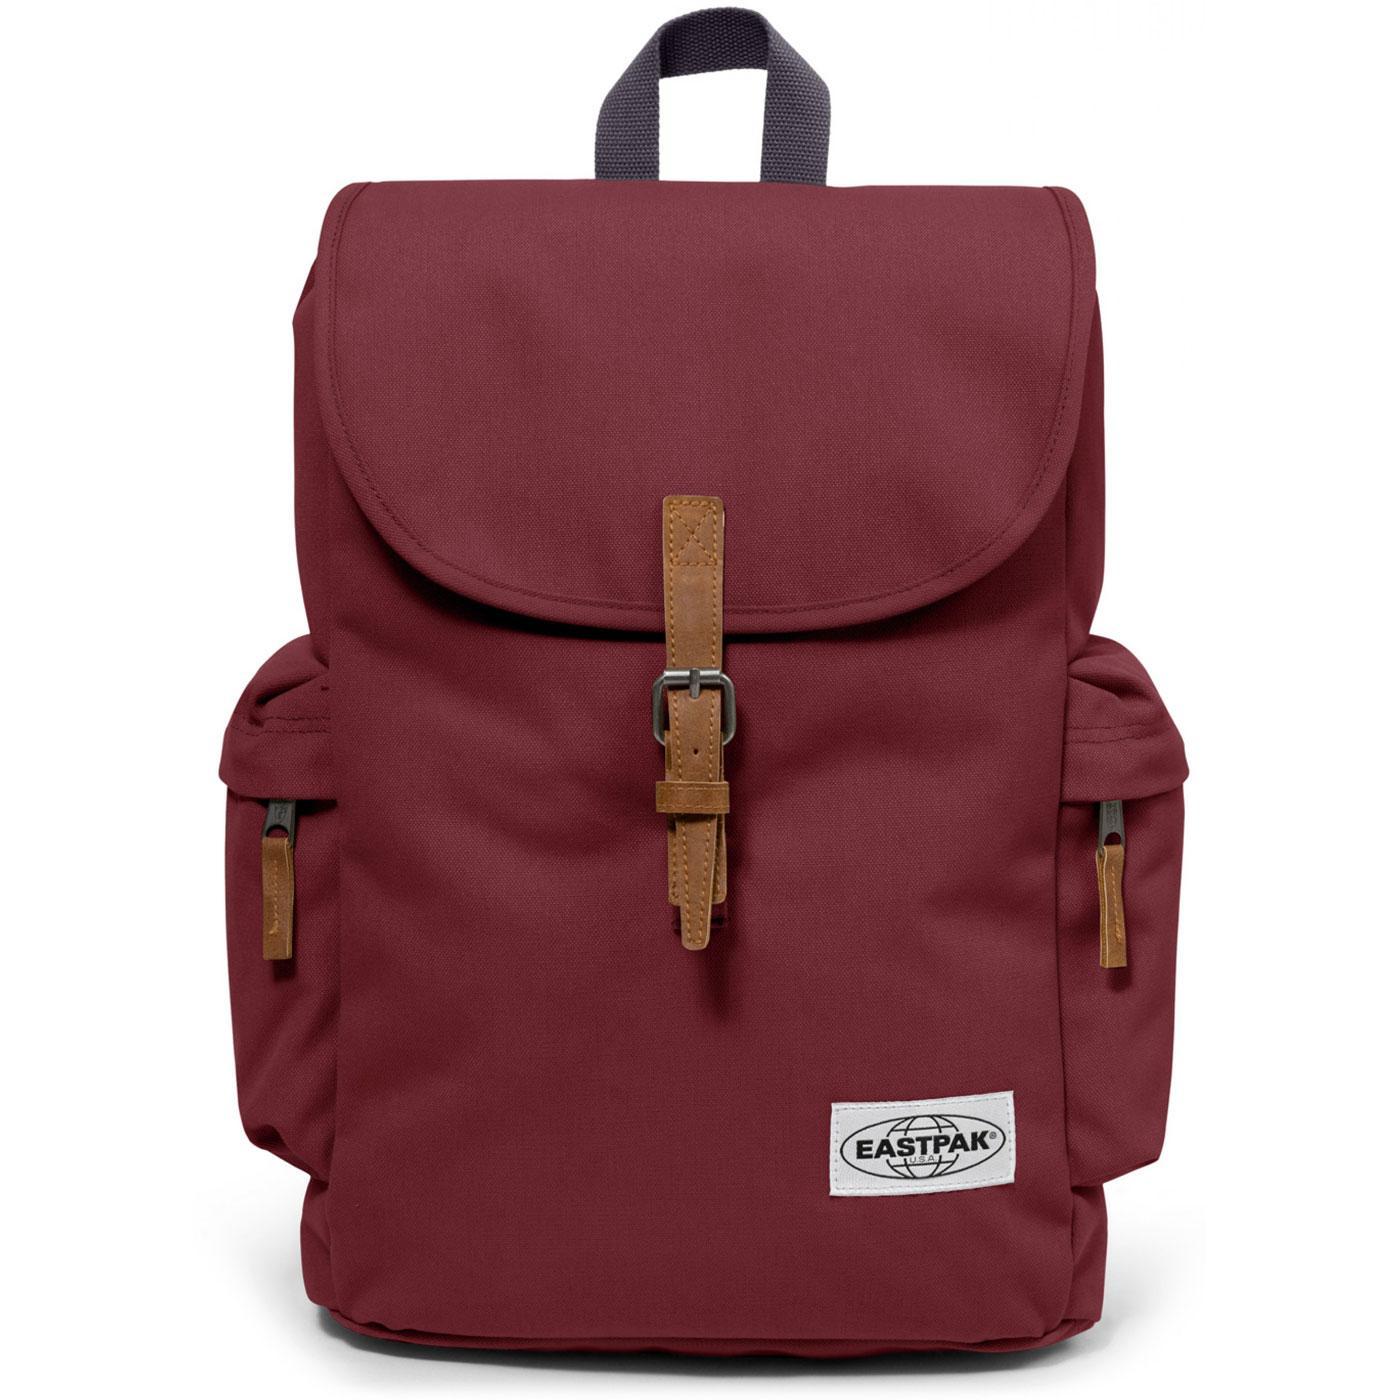 Austin EASTPAK Retro Laptop Backpack OPGRADE GRAPE